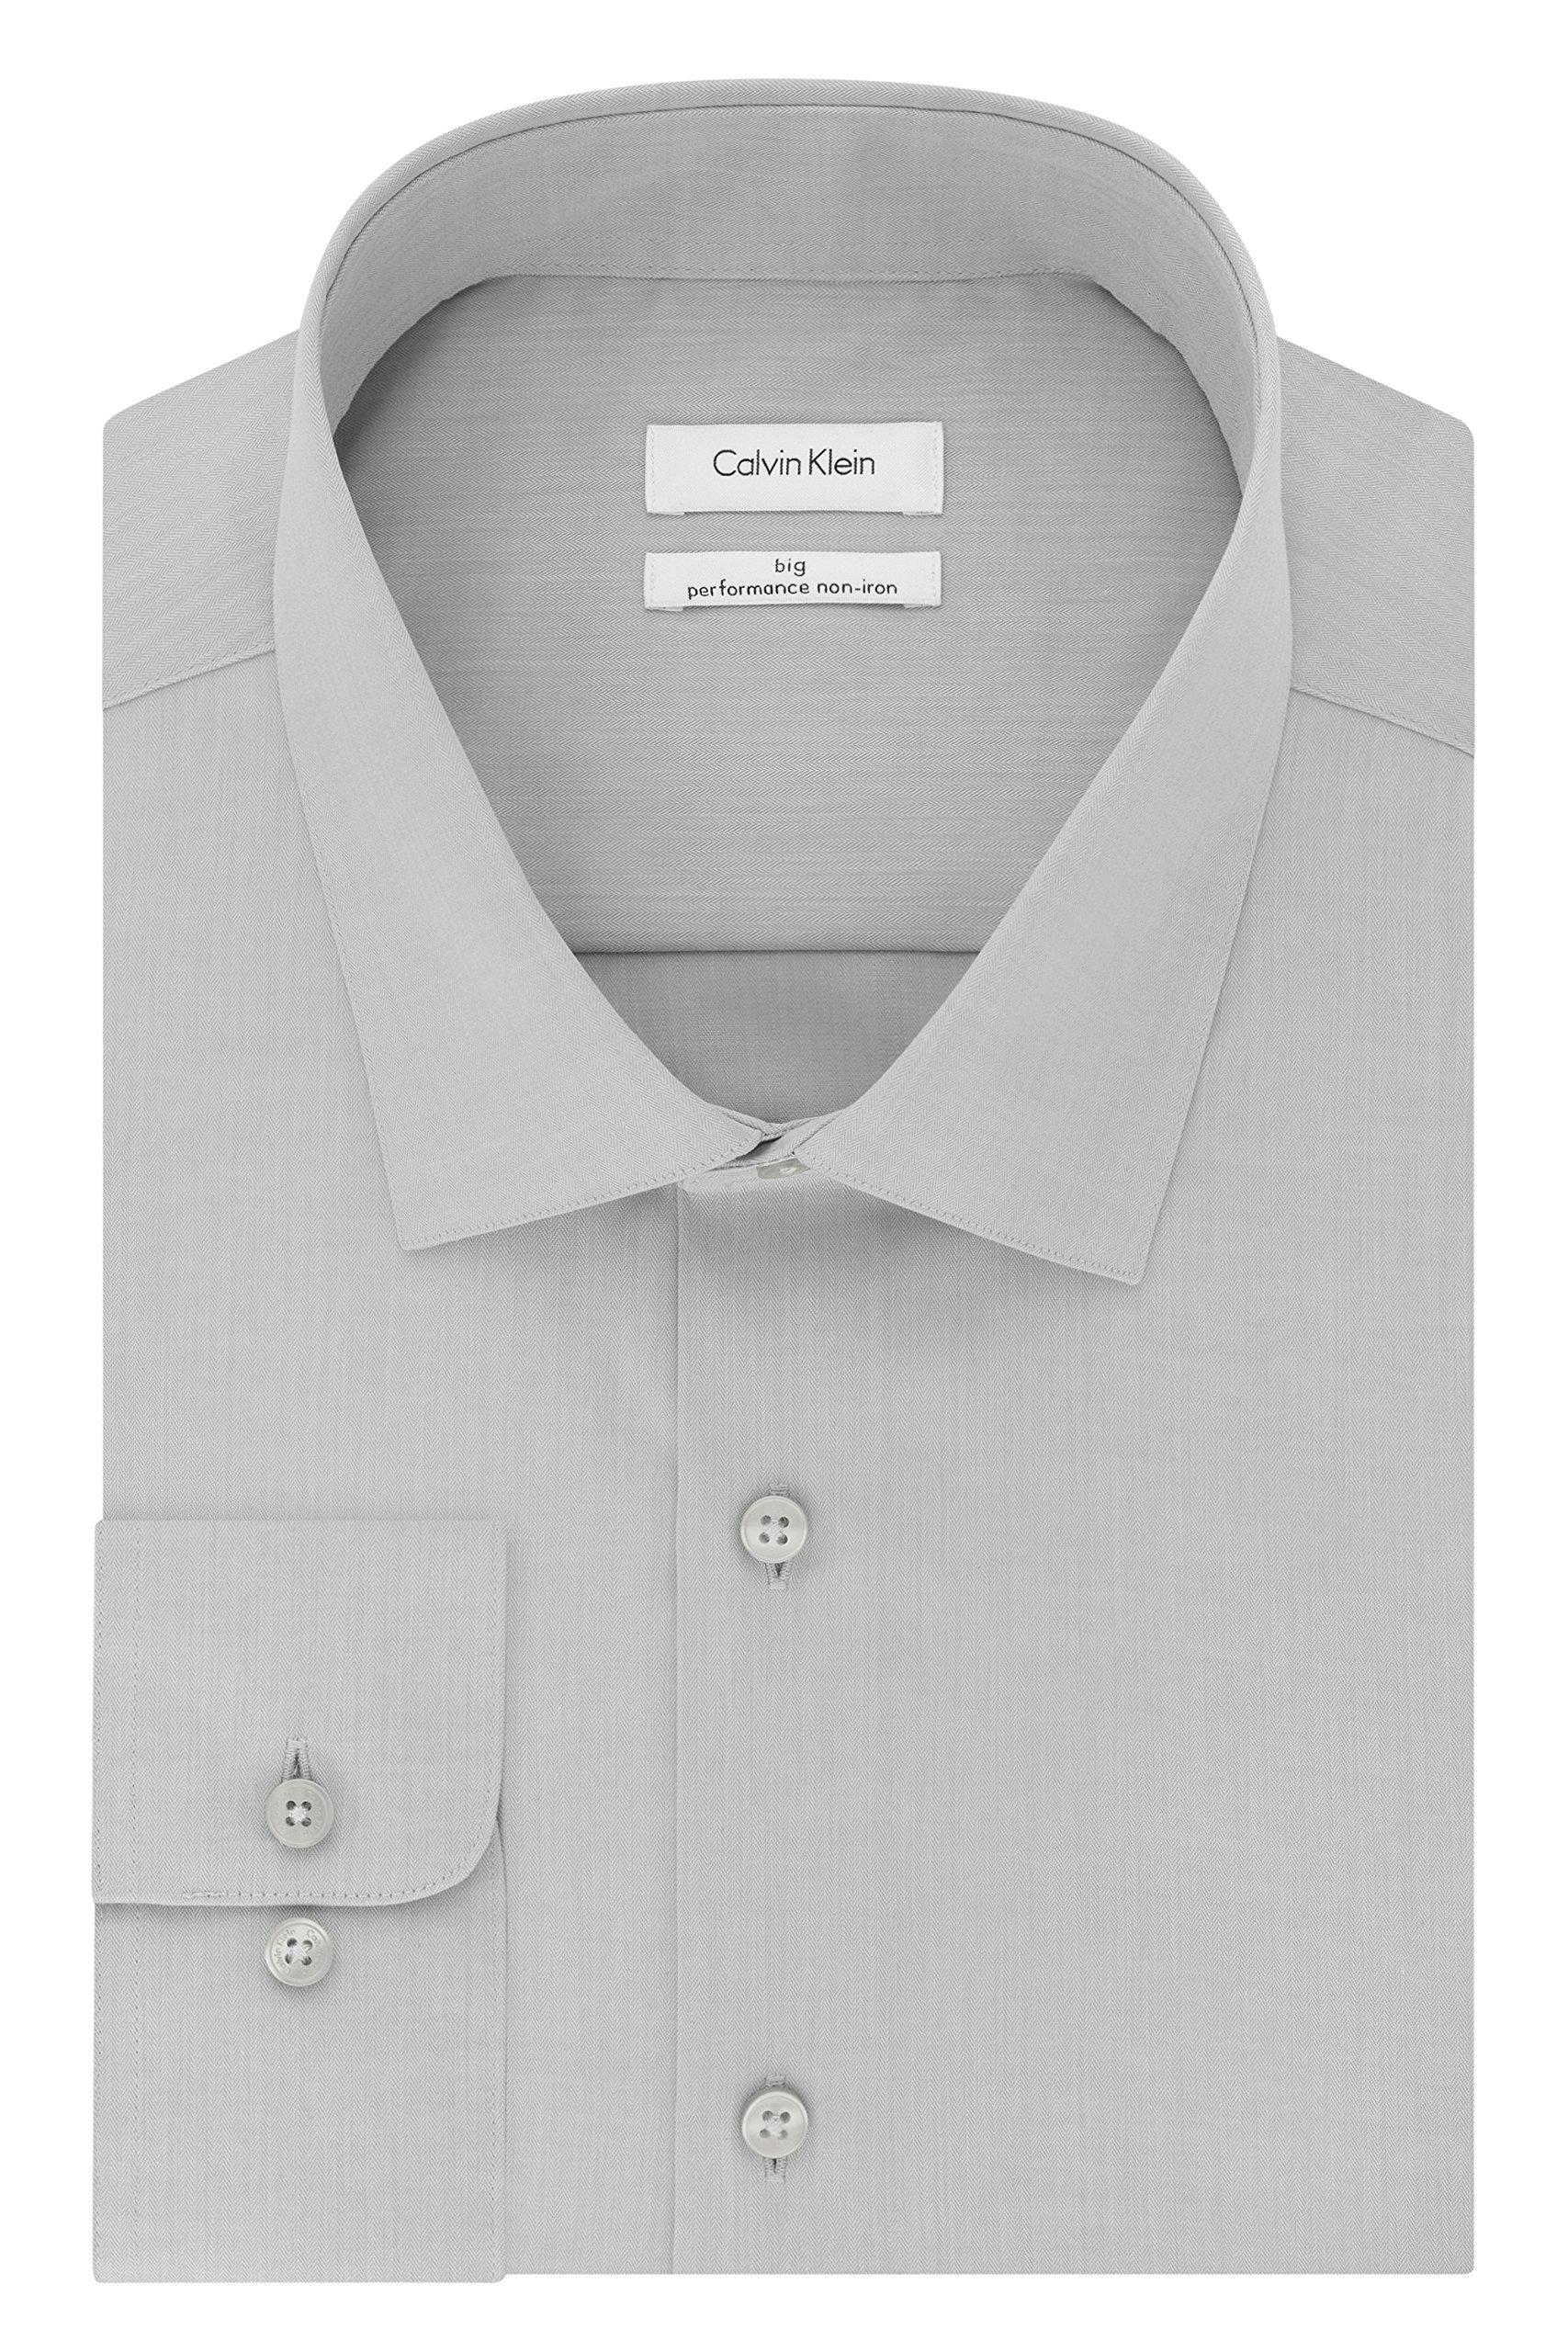 Calvin Klein Men's Big and Tall Non Iron Herringbone Spread Collar Dress Shirt, Smoke, 18'' Neck 34''-35'' Sleeve